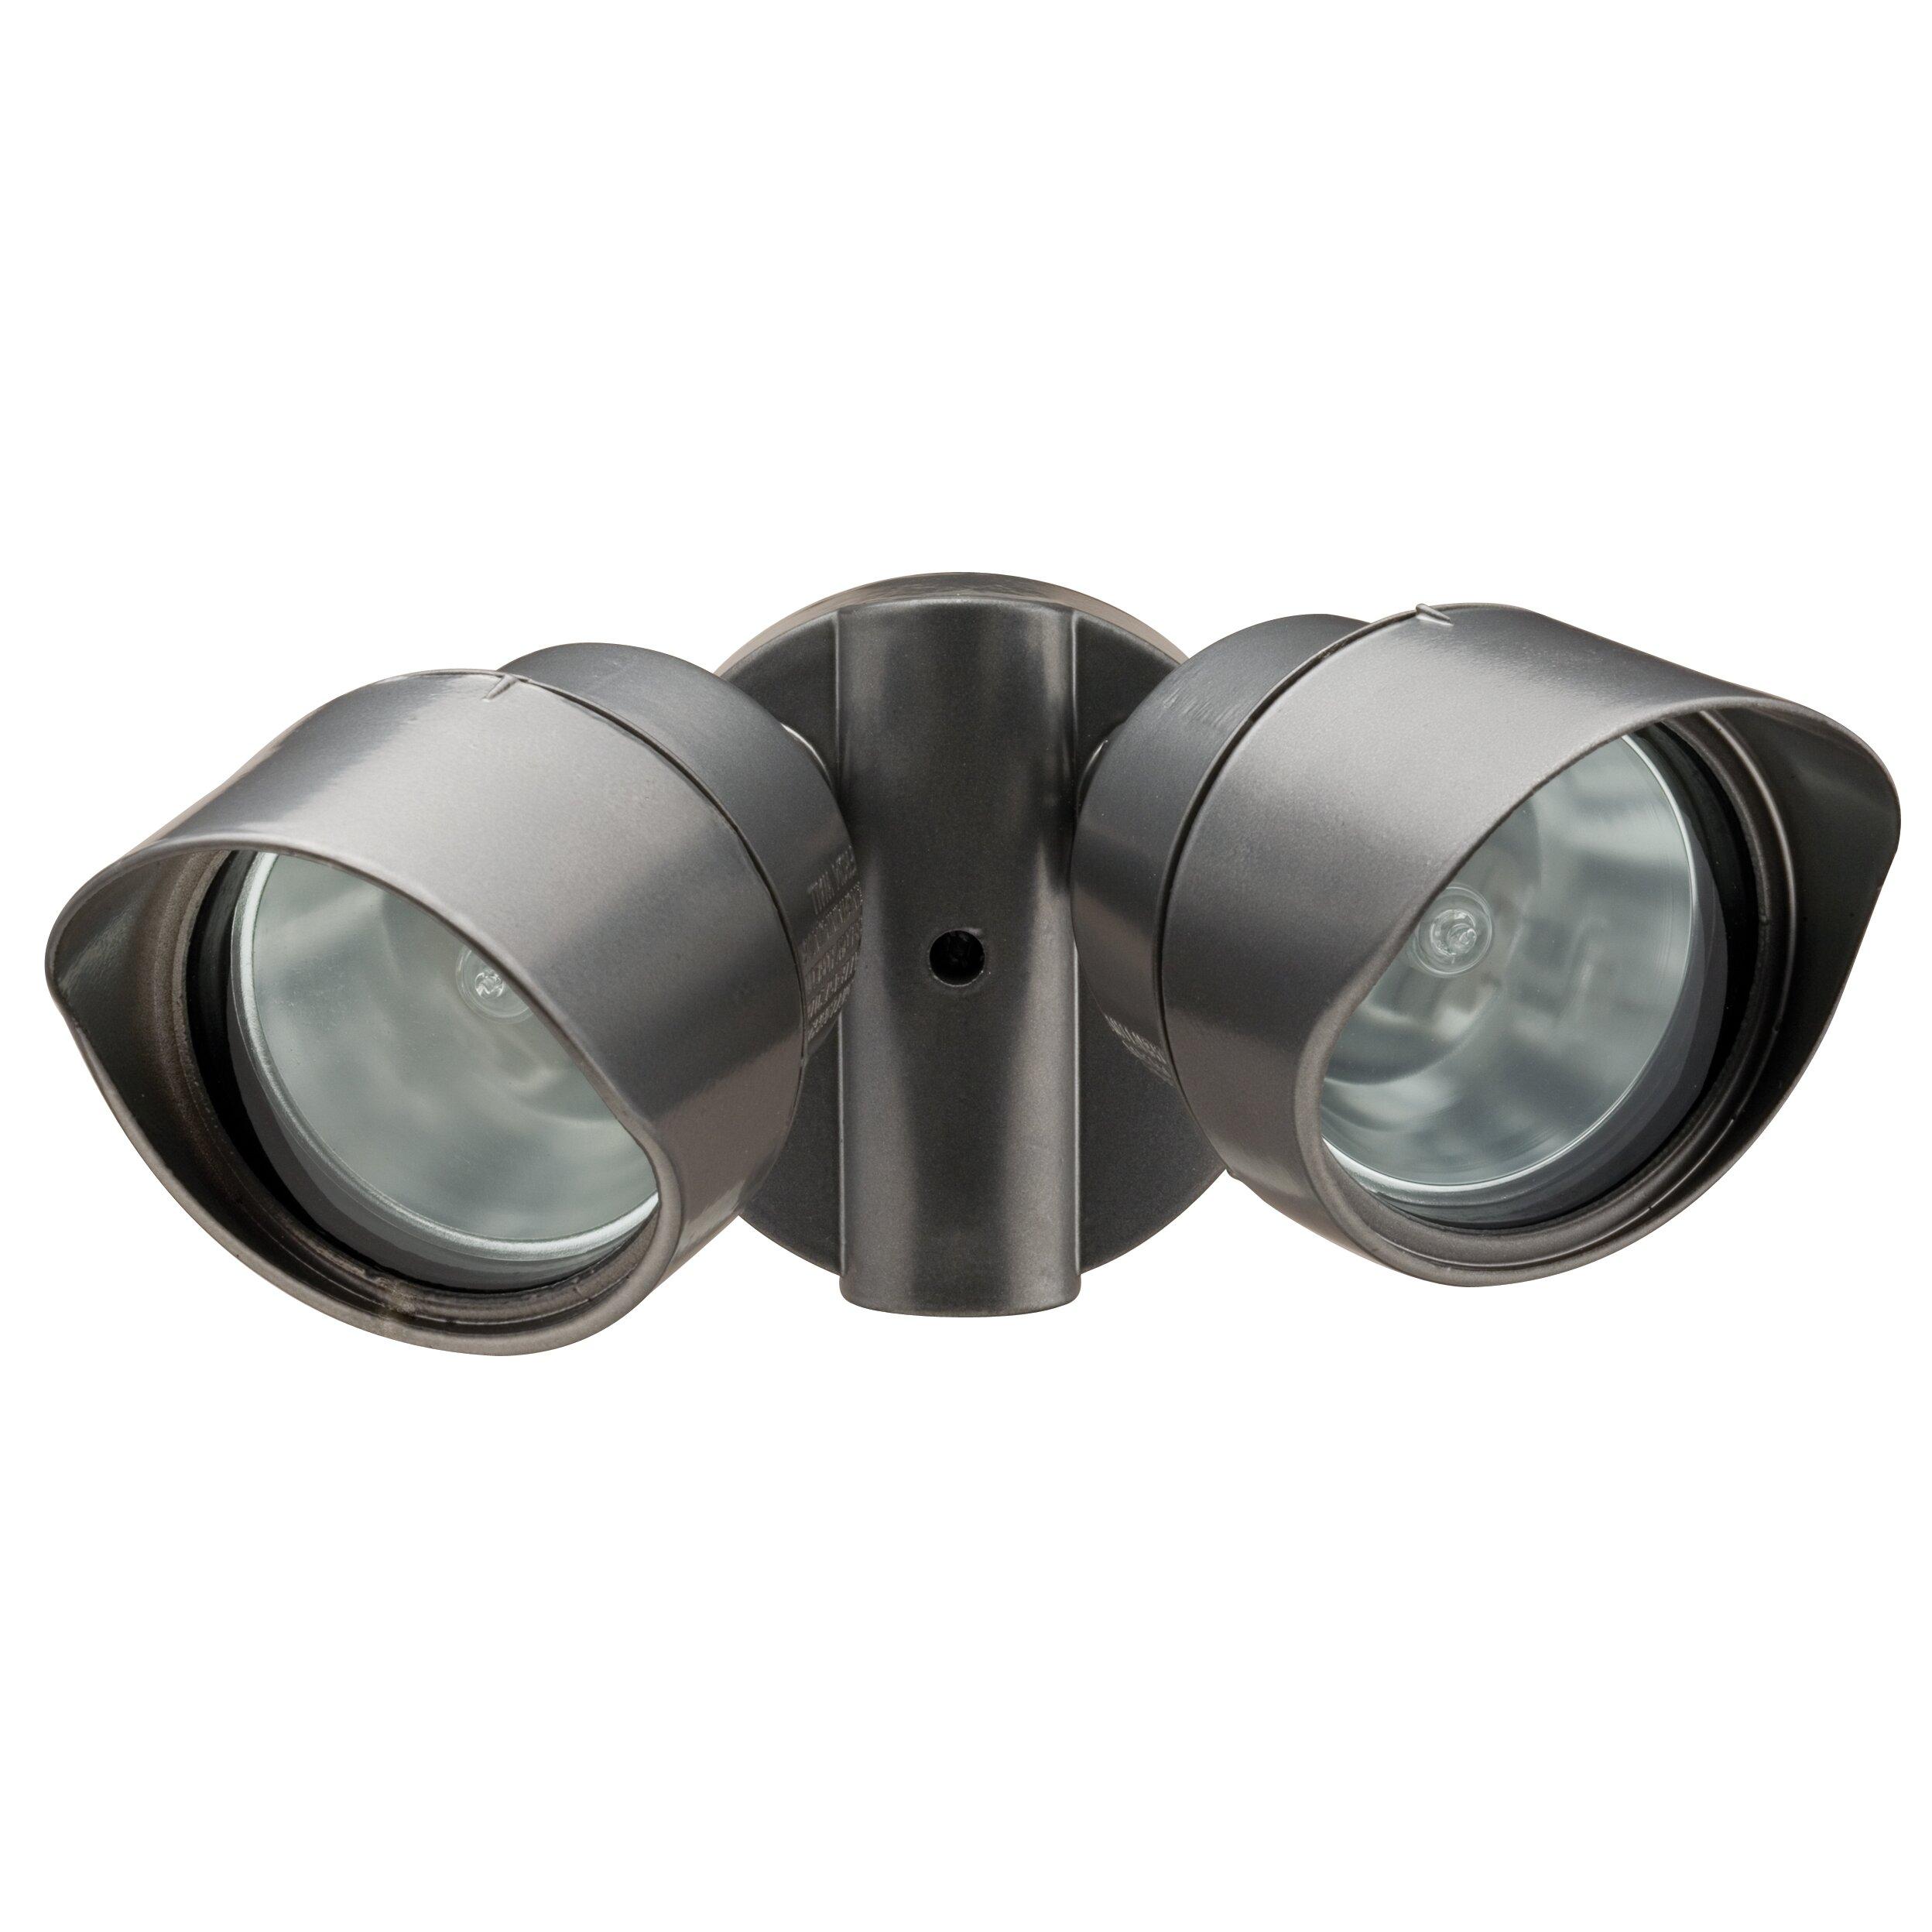 lithonia lighting security flood light reviews wayfair. Black Bedroom Furniture Sets. Home Design Ideas